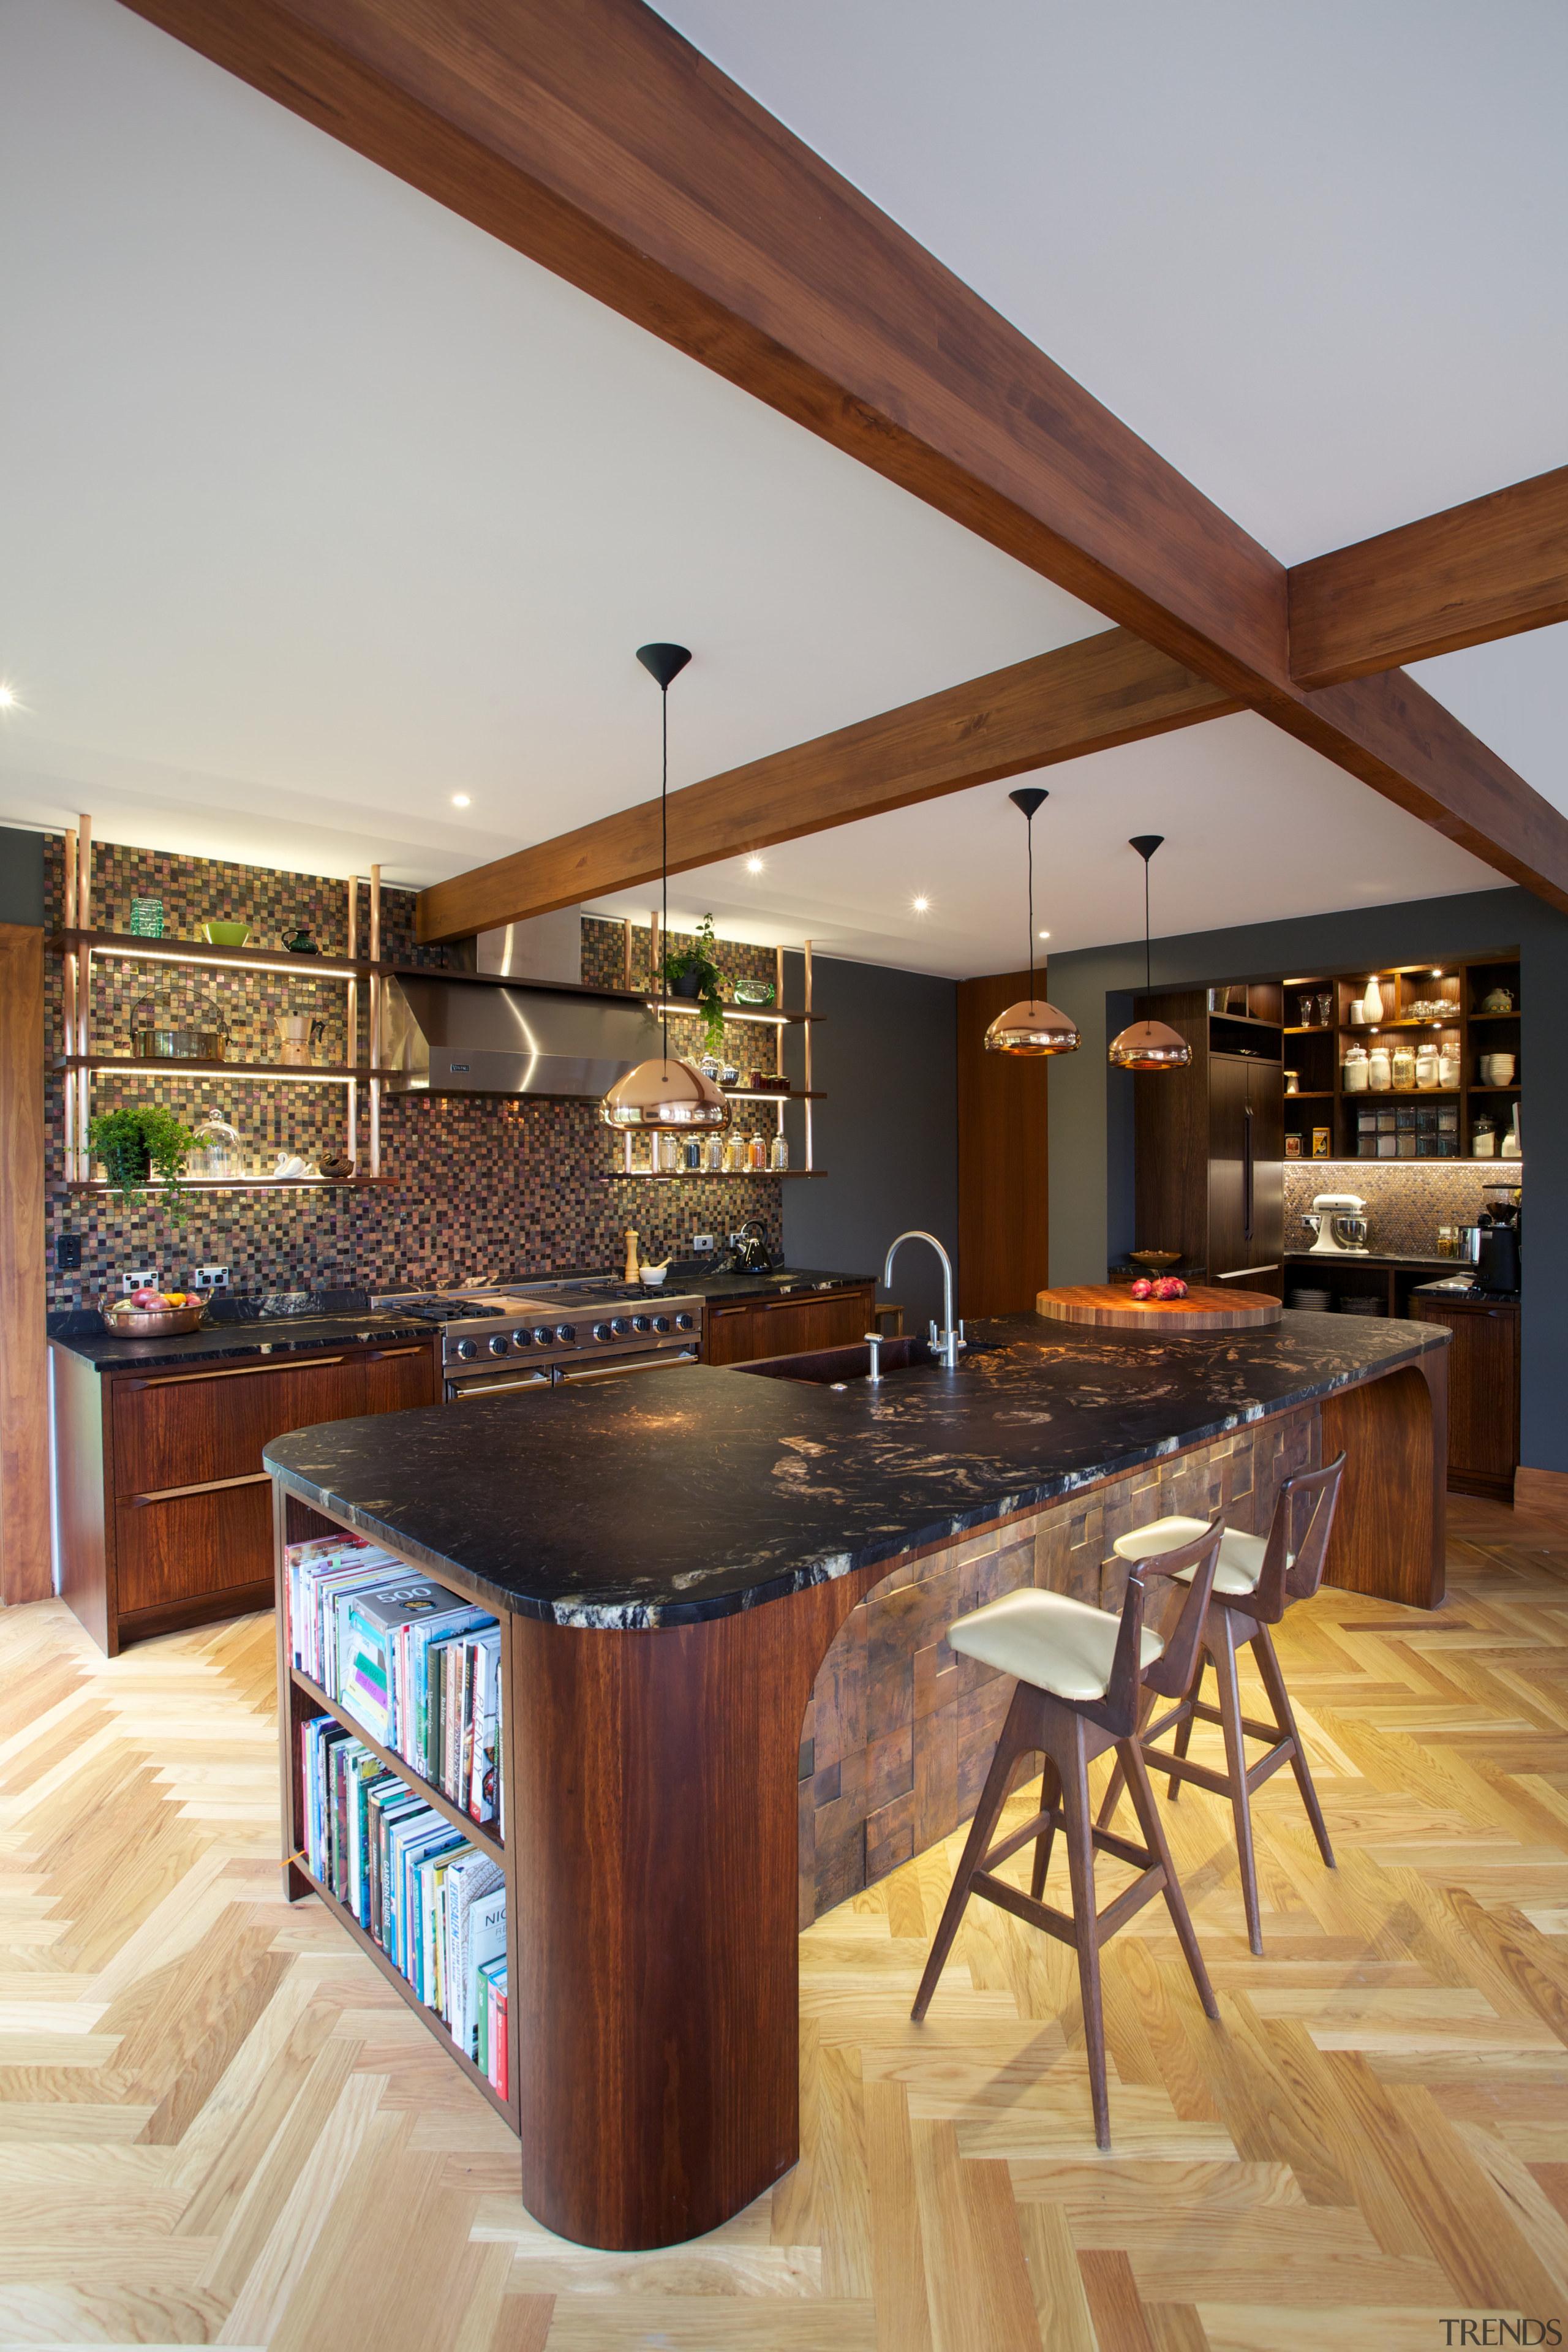 Long-grain birch cabinetry kitchen design by Du Bois countertop, cuisine classique, flooring, hardwood, interior design, kitchen, real estate, wood, wood flooring, gray, brown